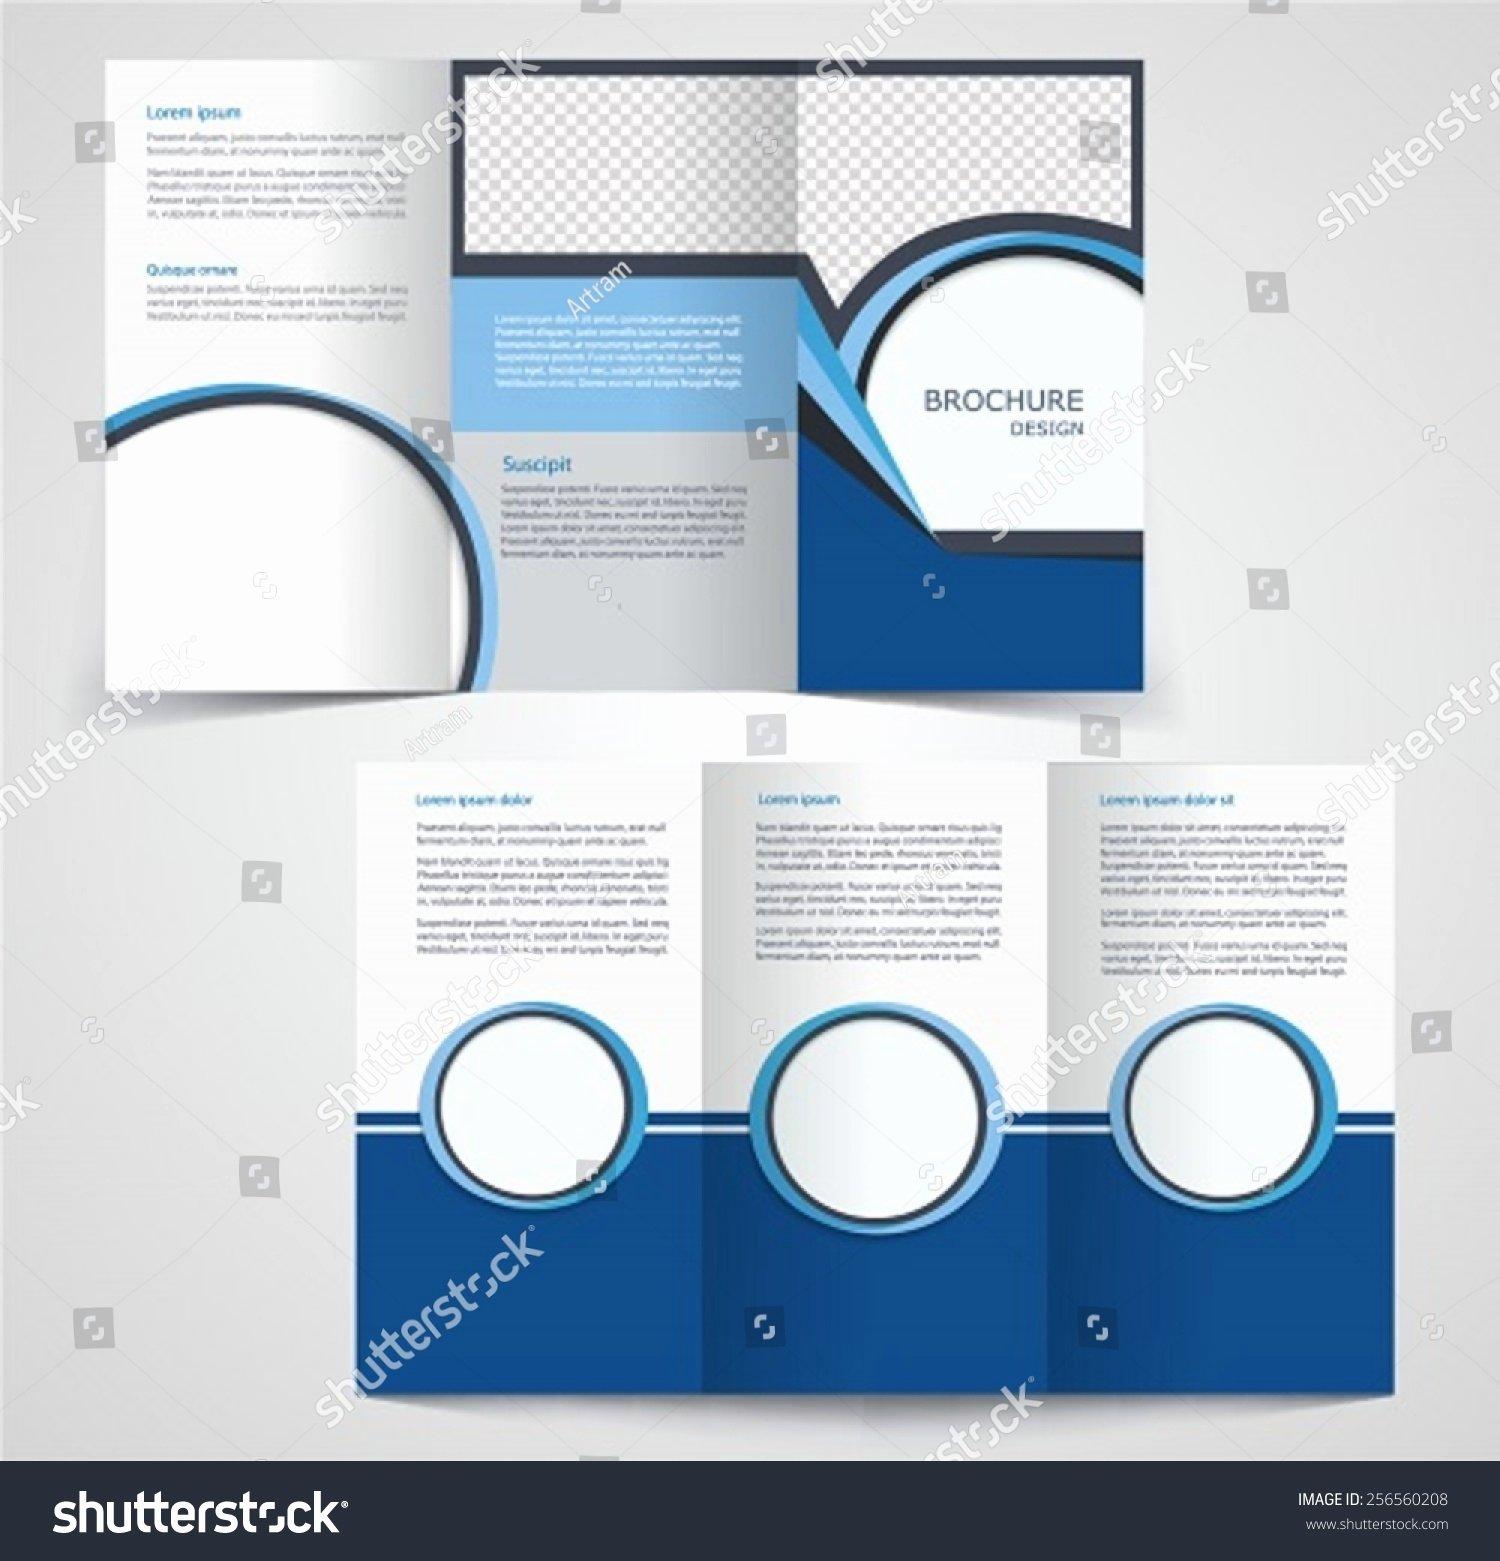 2 Fold Brochure Template Fresh Trifold Business Brochure Template Twosided Template Stock